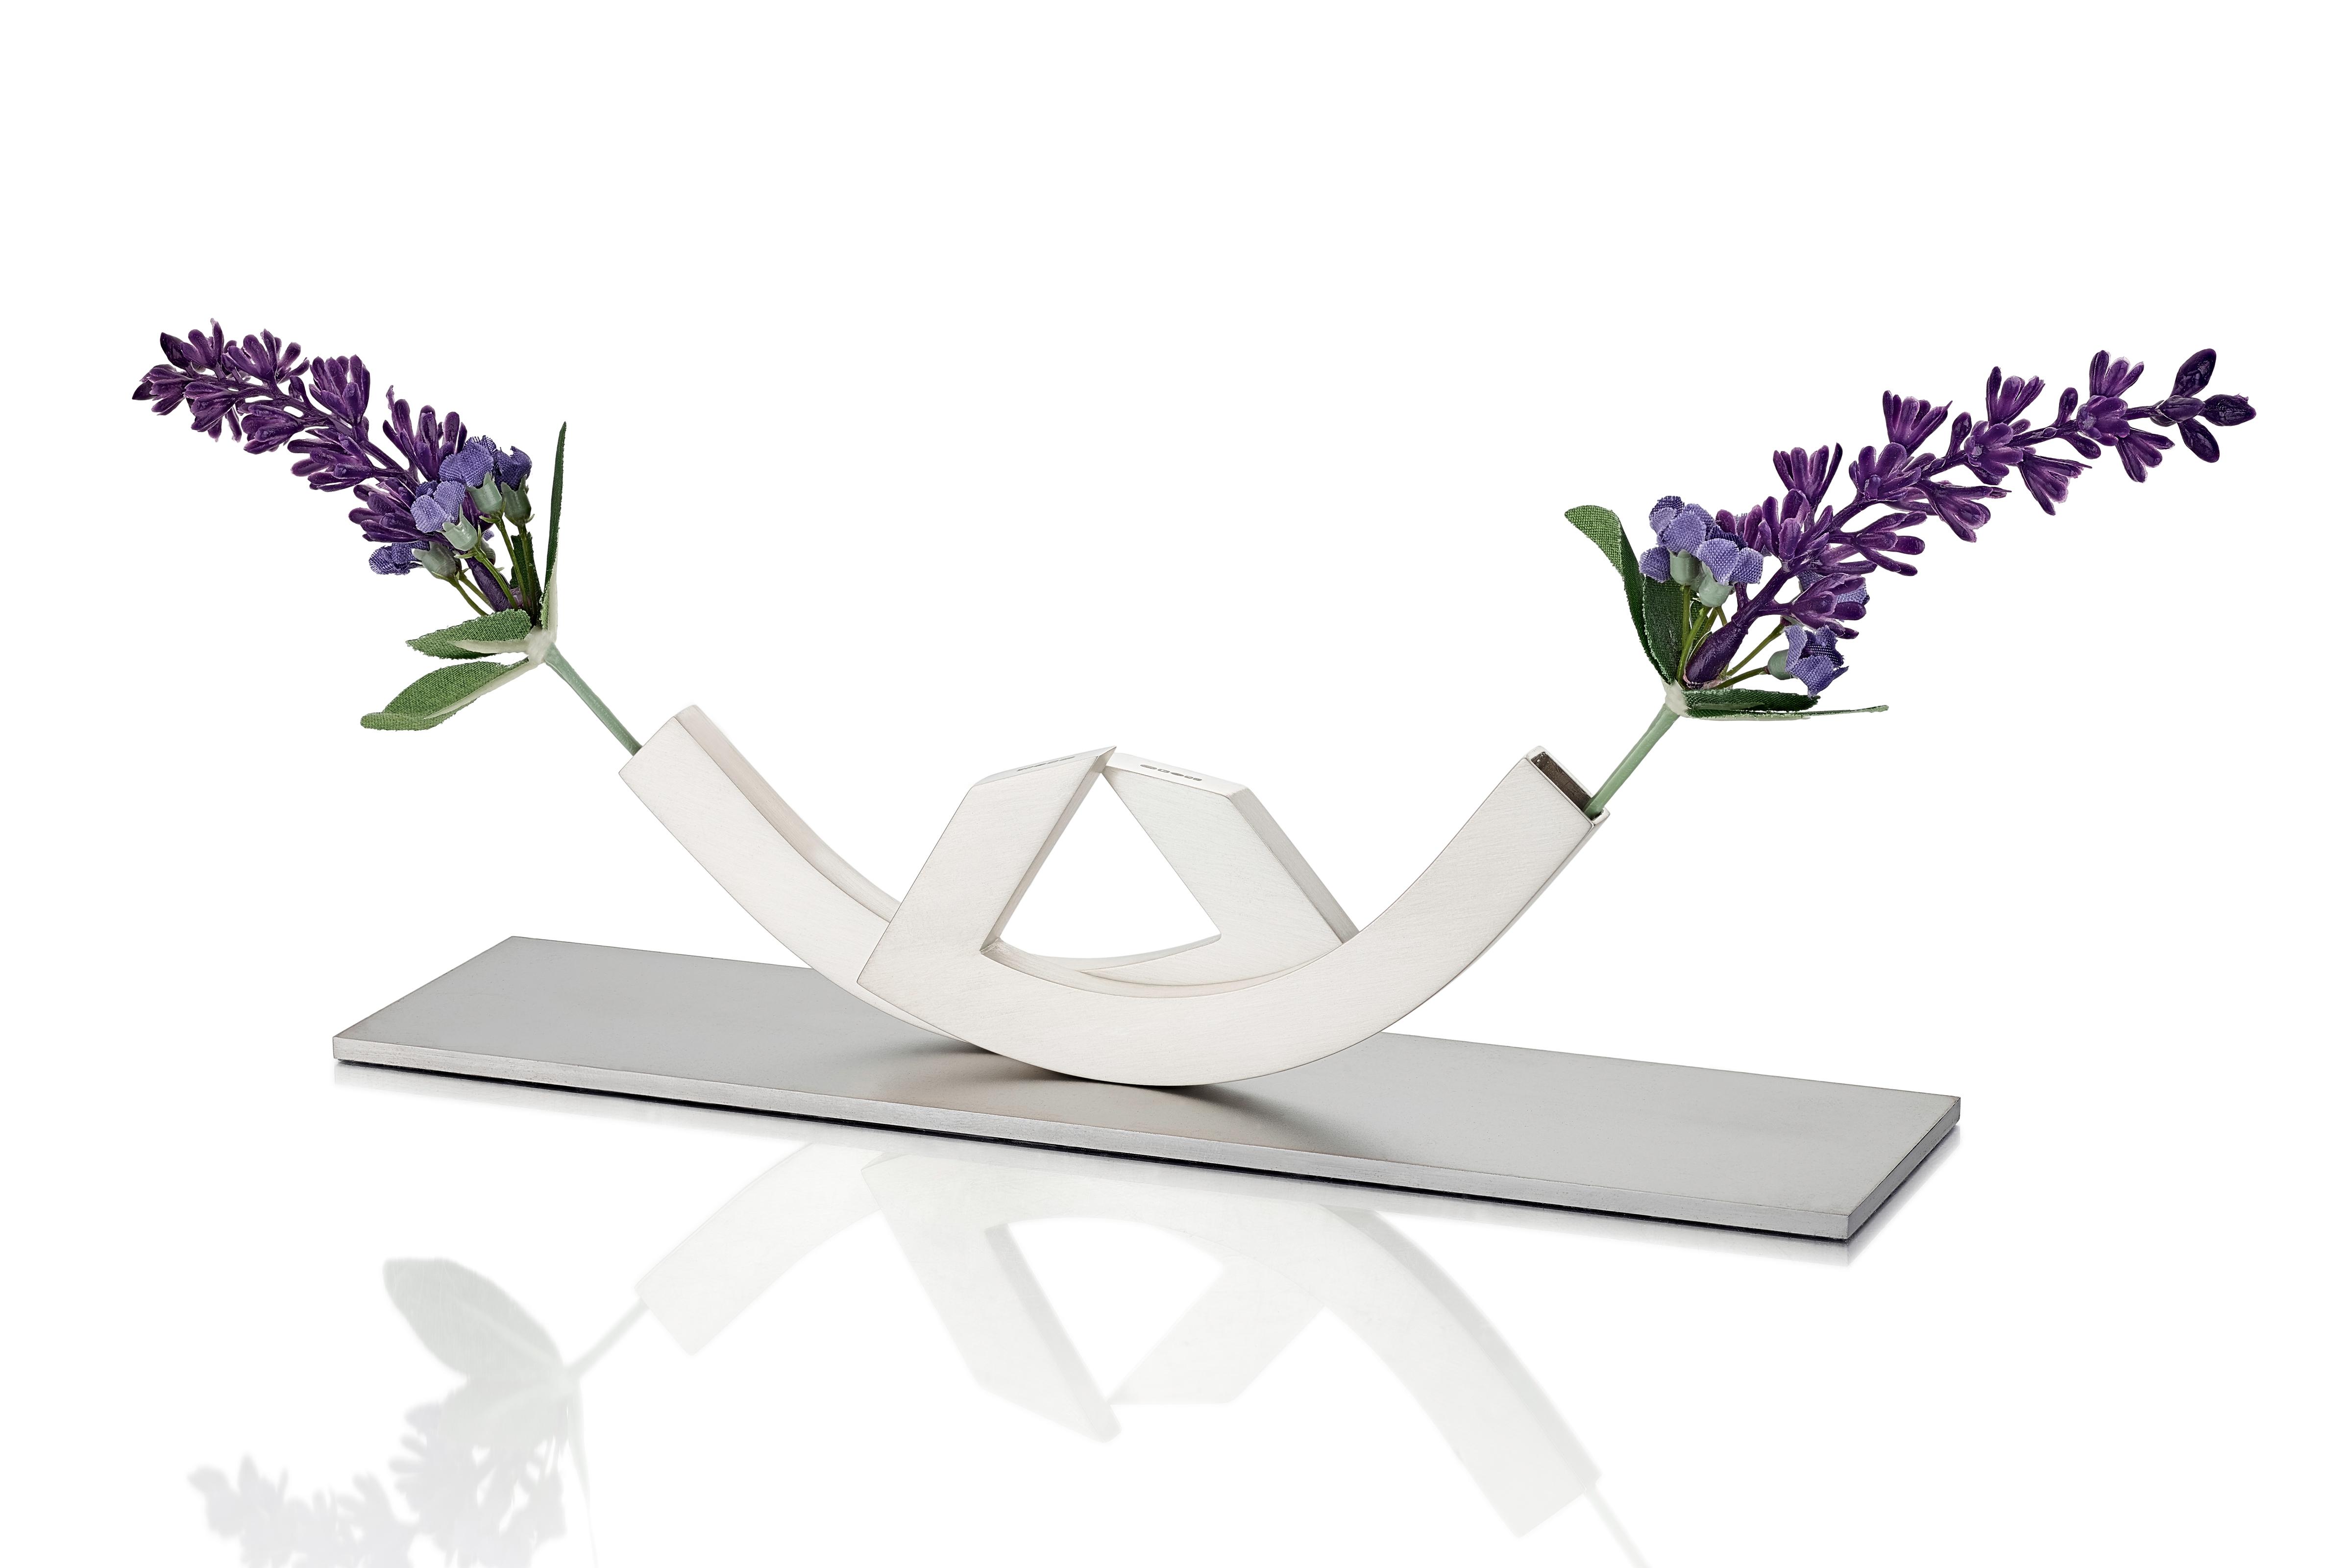 Counter Balance Vases – Copyright BJRdesigns